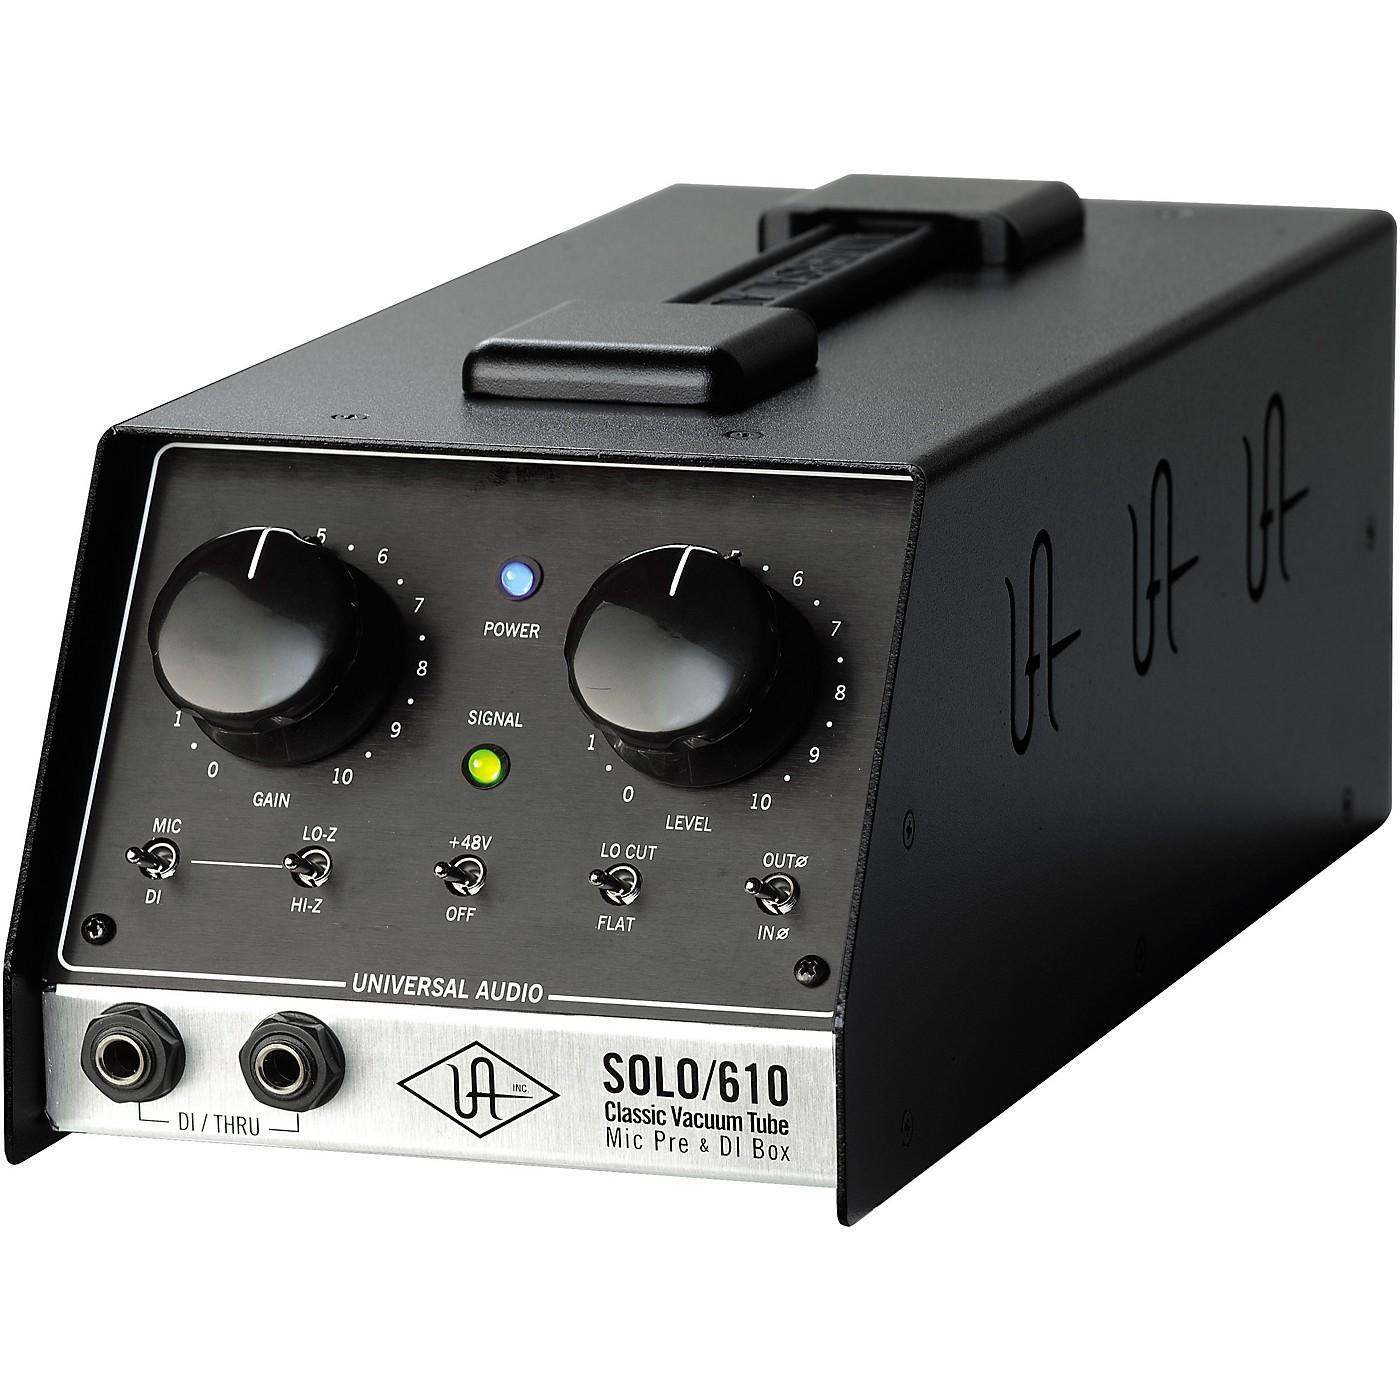 Universal Audio UA-S610 SOLO/610 Classic Vacuum Tube Microphone Preamp and DI Box thumbnail